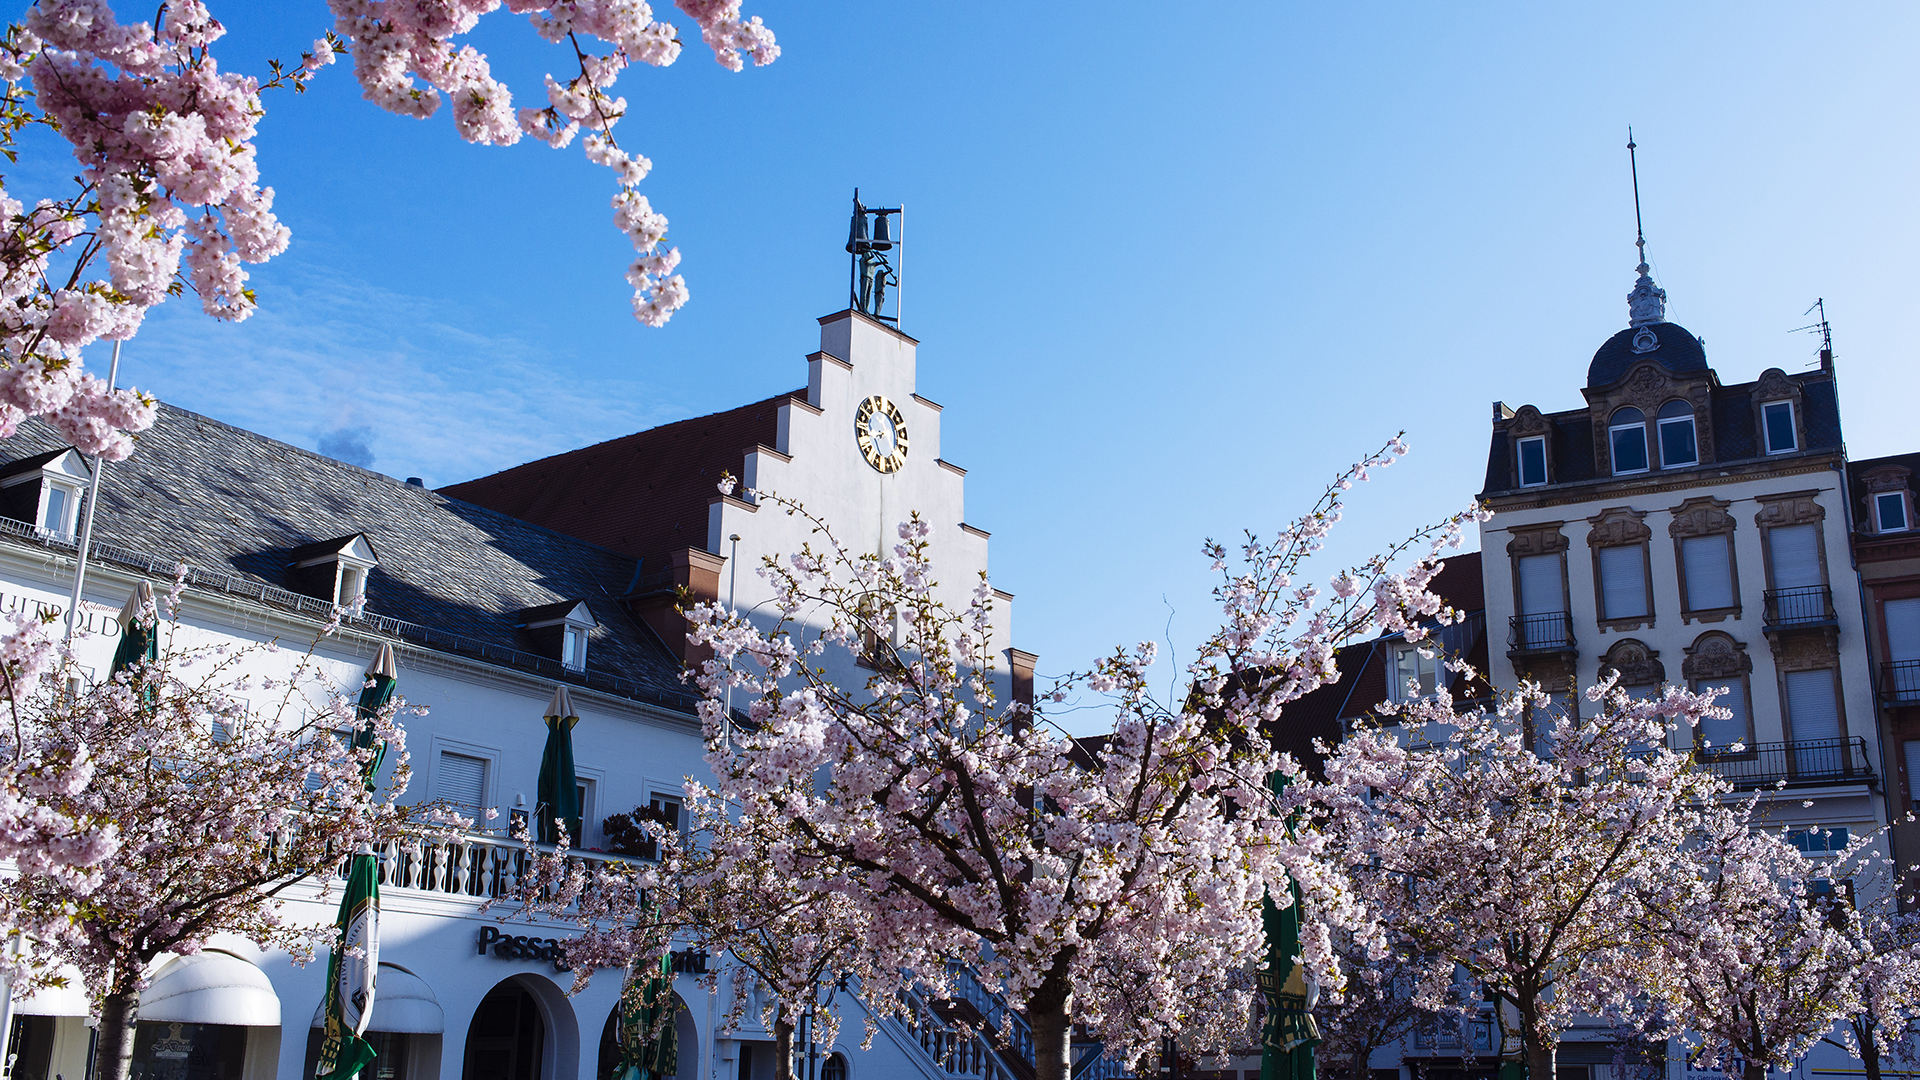 Weinhotel Kienle Umgebung im Frühling